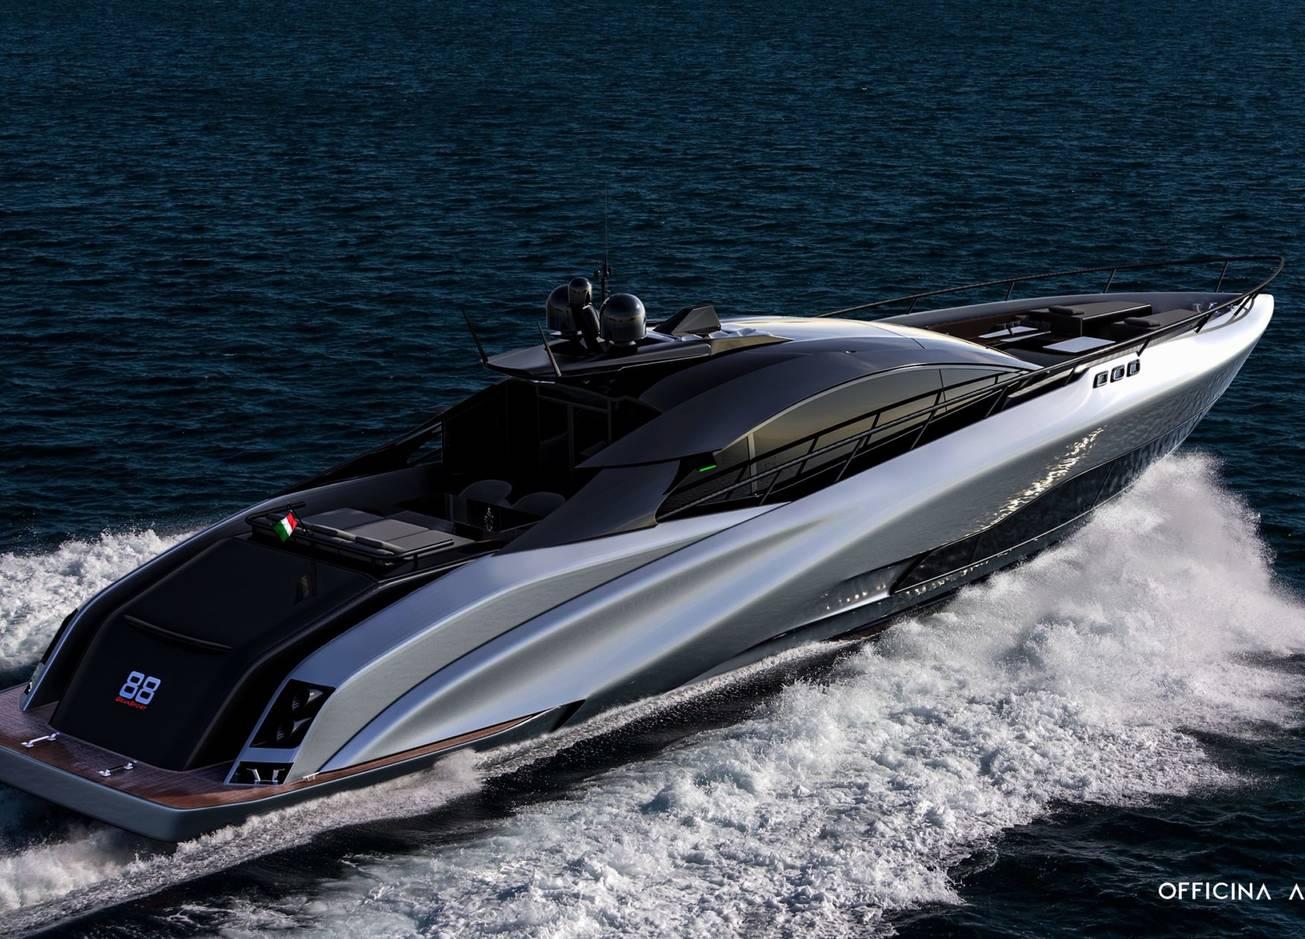 Морской Lamborghini: концепт яхты A88 Gransport от Officina Armare